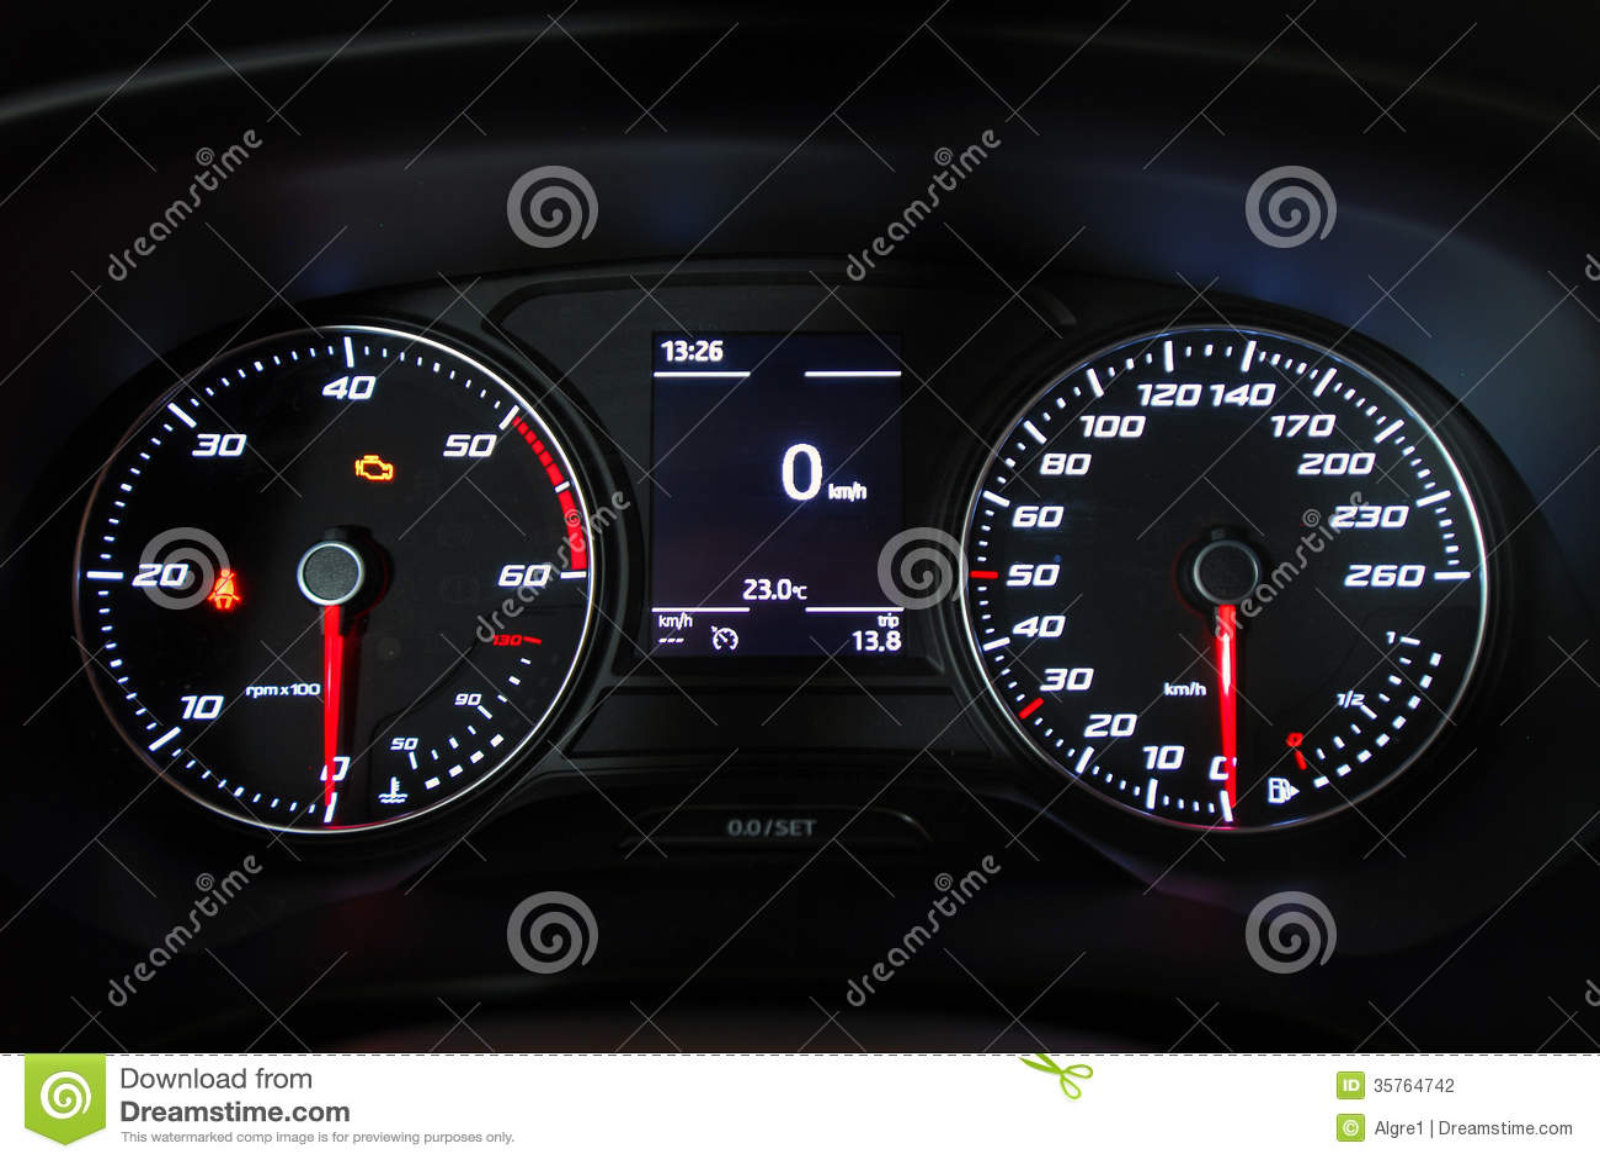 Armaturenbrett auto  Auto Belichteter Armaturenbrett Stockfotografie - Bild: 35764742